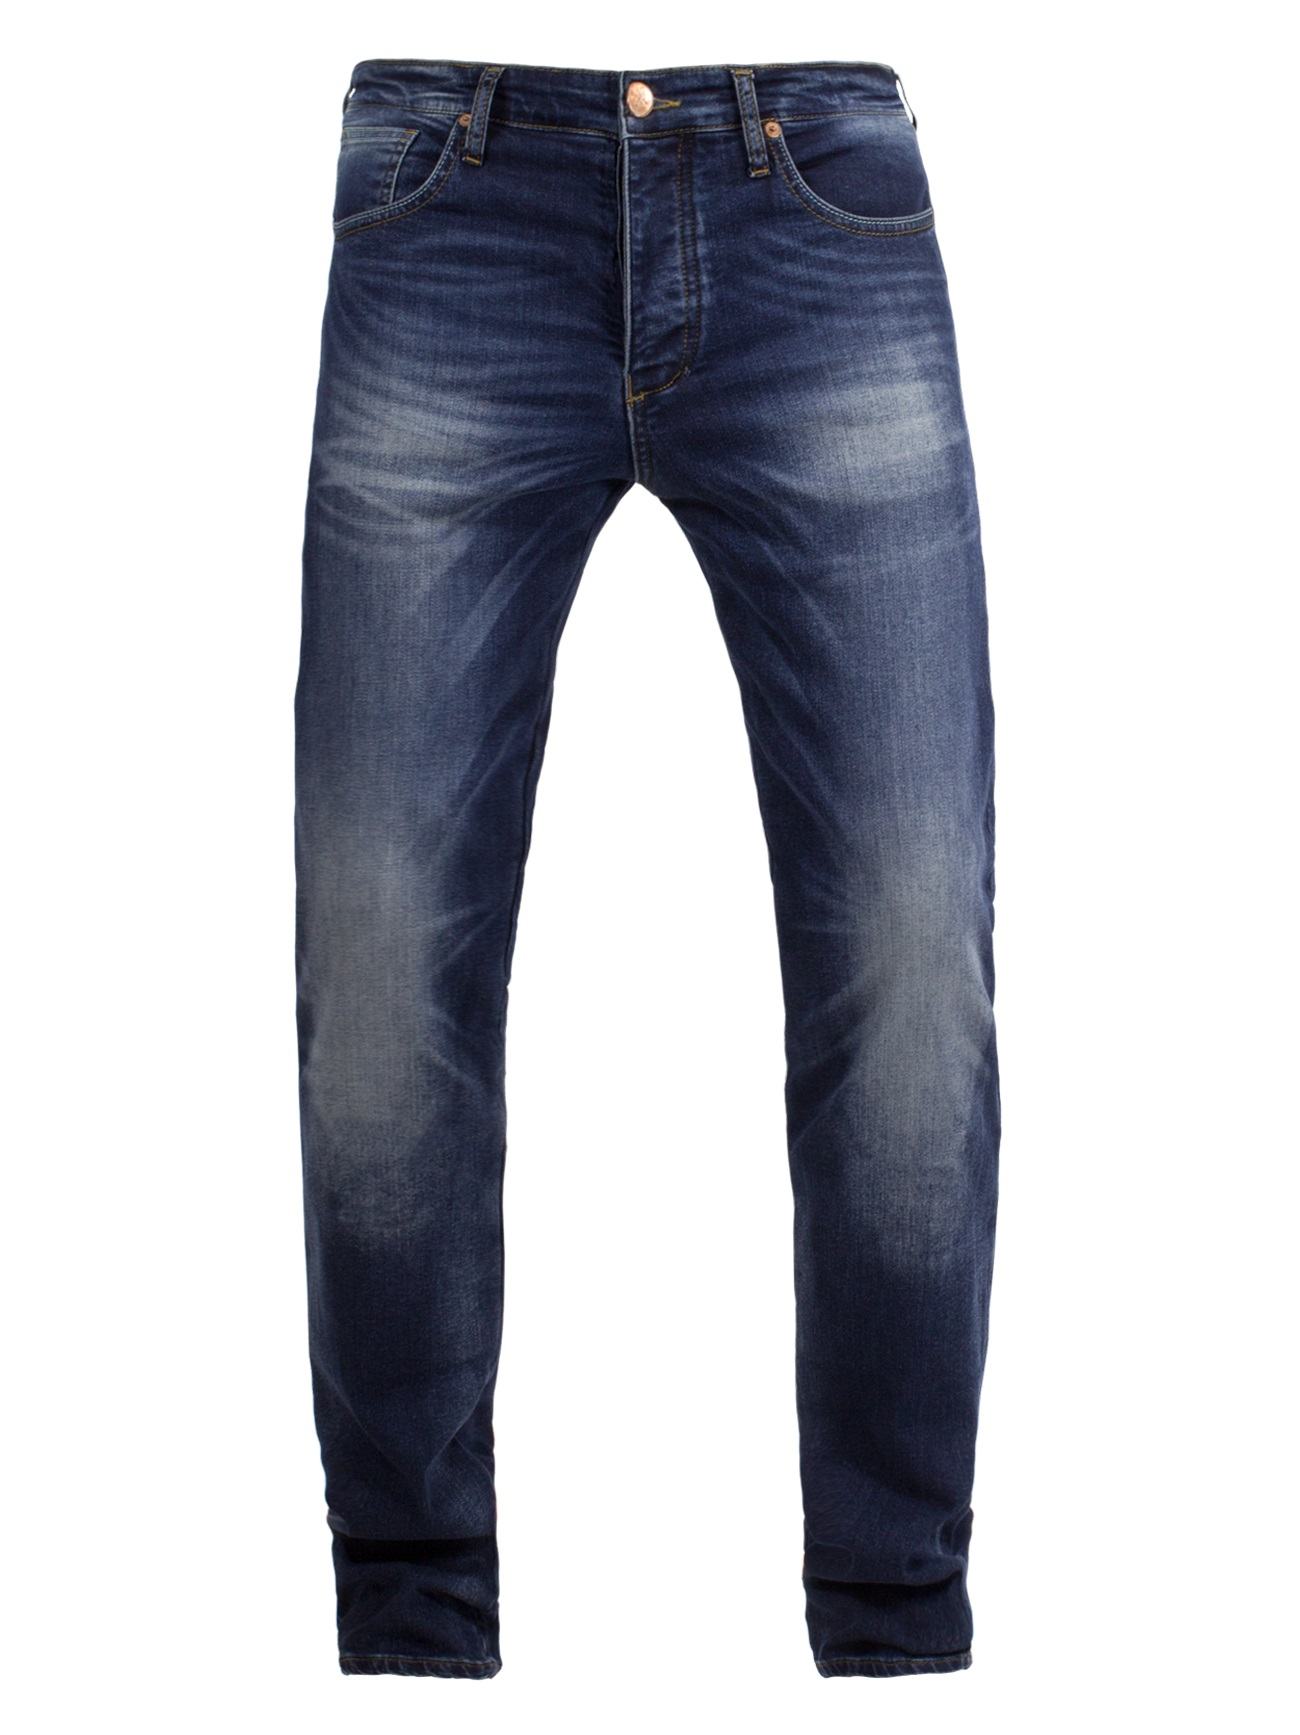 John Doe Ironhead XTM Jeans Motorista Used Dark Azul  40/34